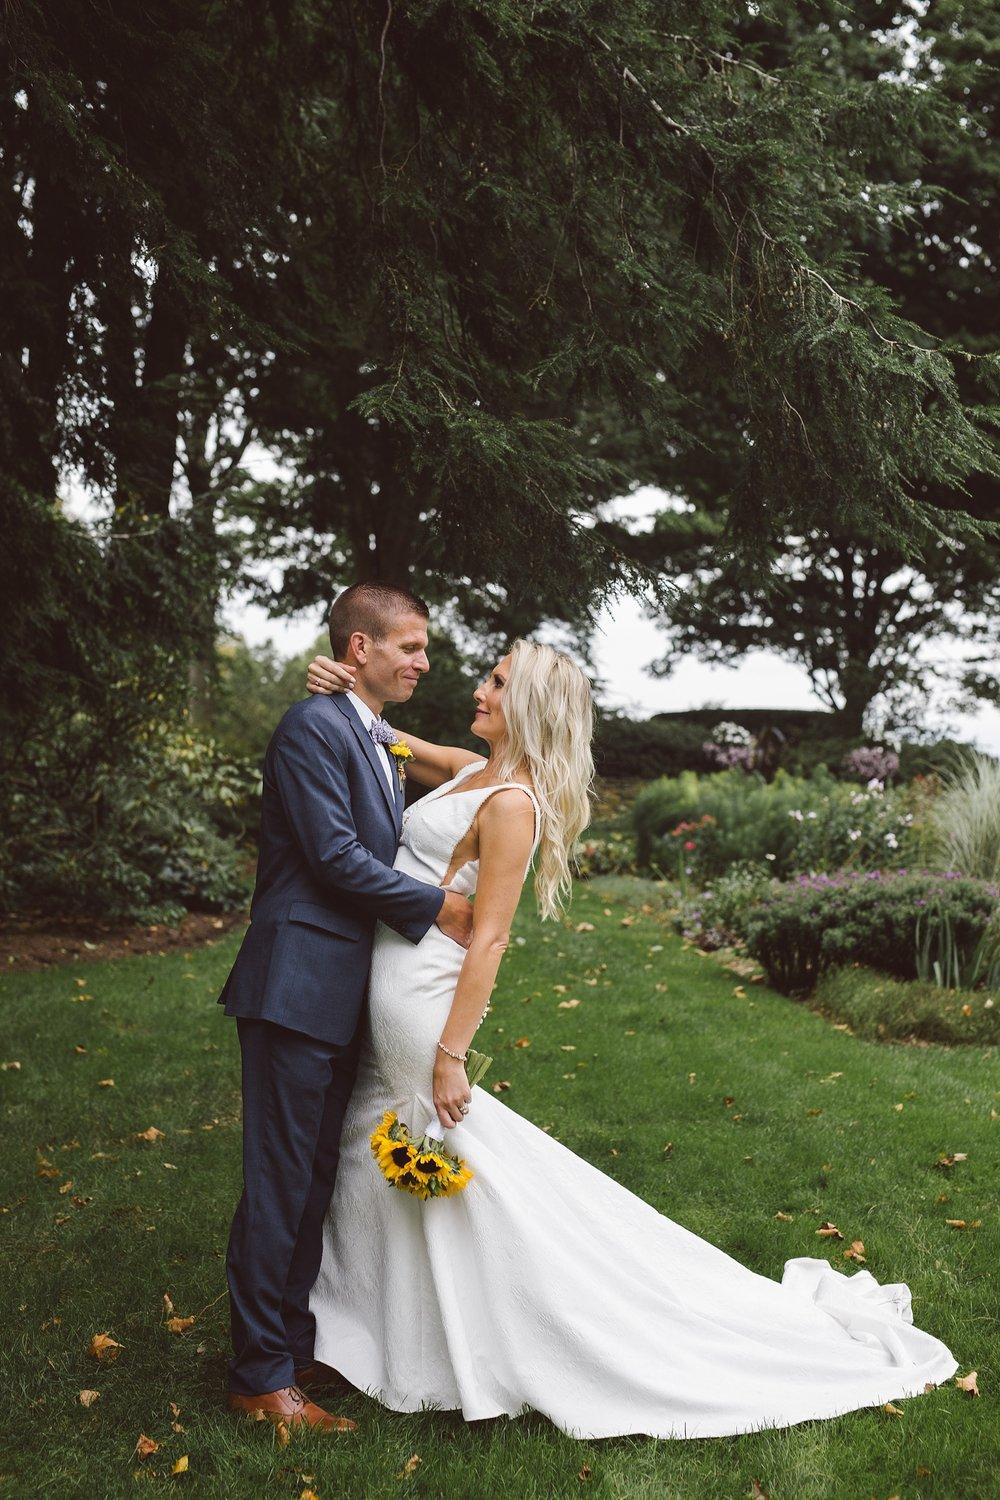 Druemore_Joe_Mac_Creative_Philadelphila_Wedding_Photography_drumore_estate_pequea_Best_lancaster_wedding_venues_0063.jpg